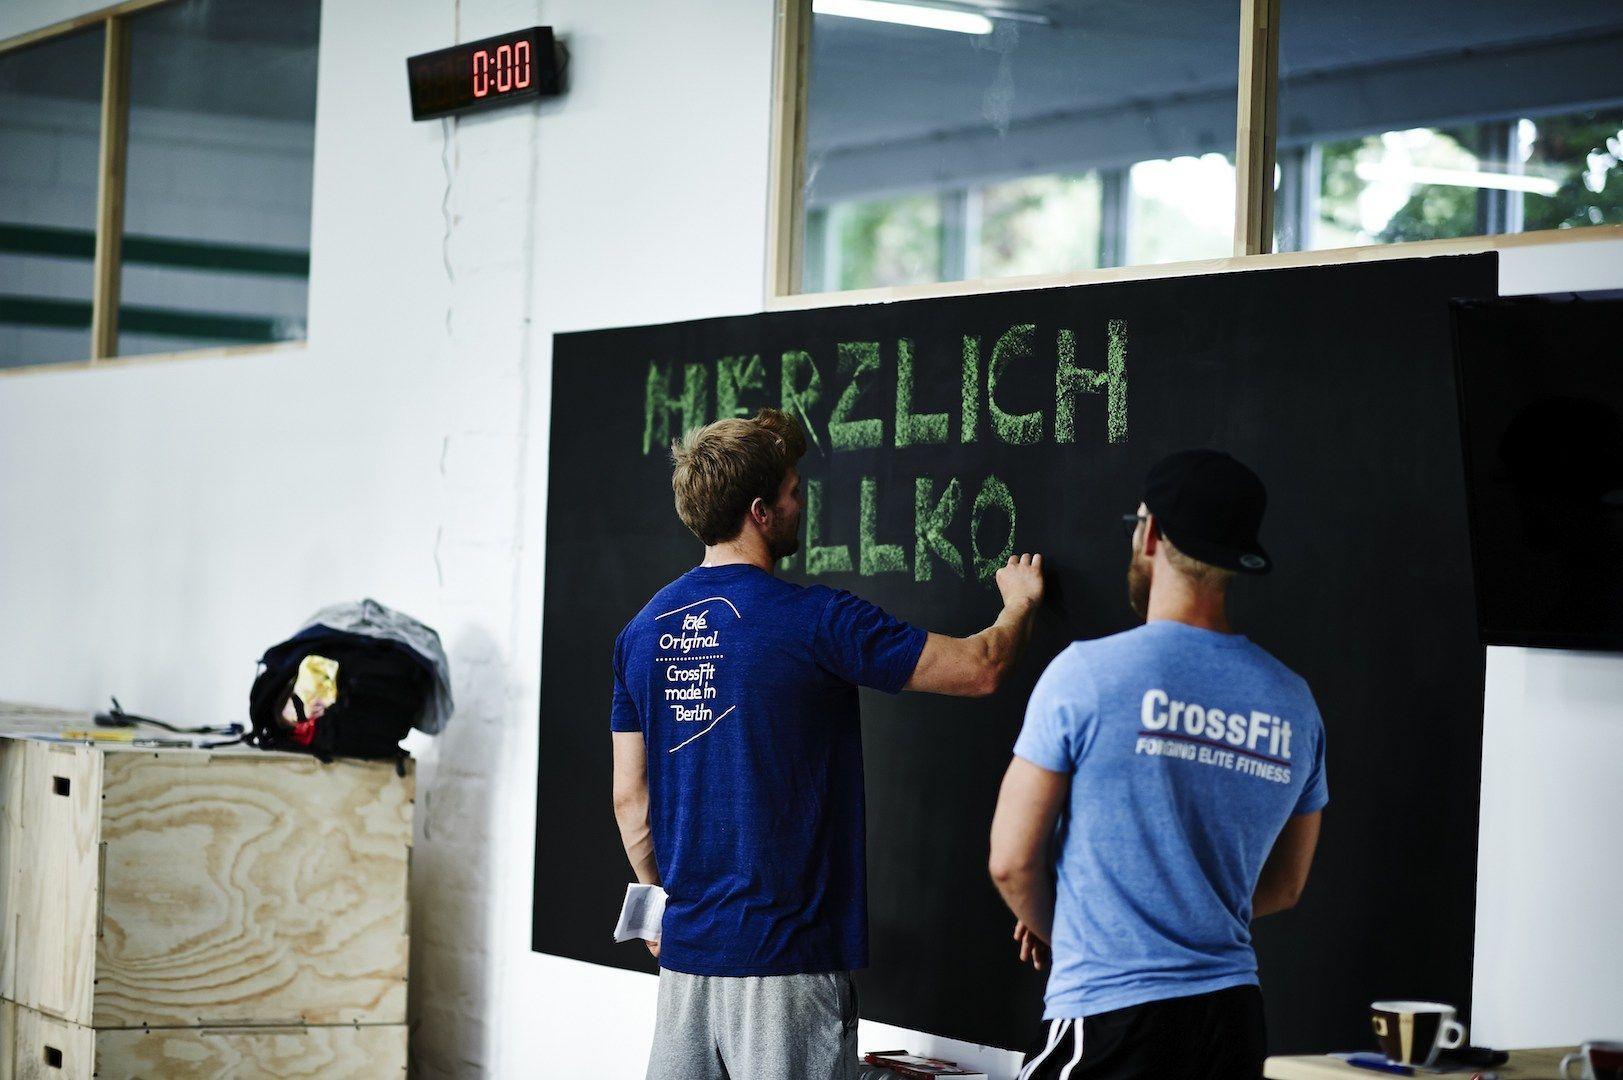 #Berlin #CrossFit #dein #fitness #fitnessstudio #langhantel fitness #preisvergleich #Berlin #CrossFi...